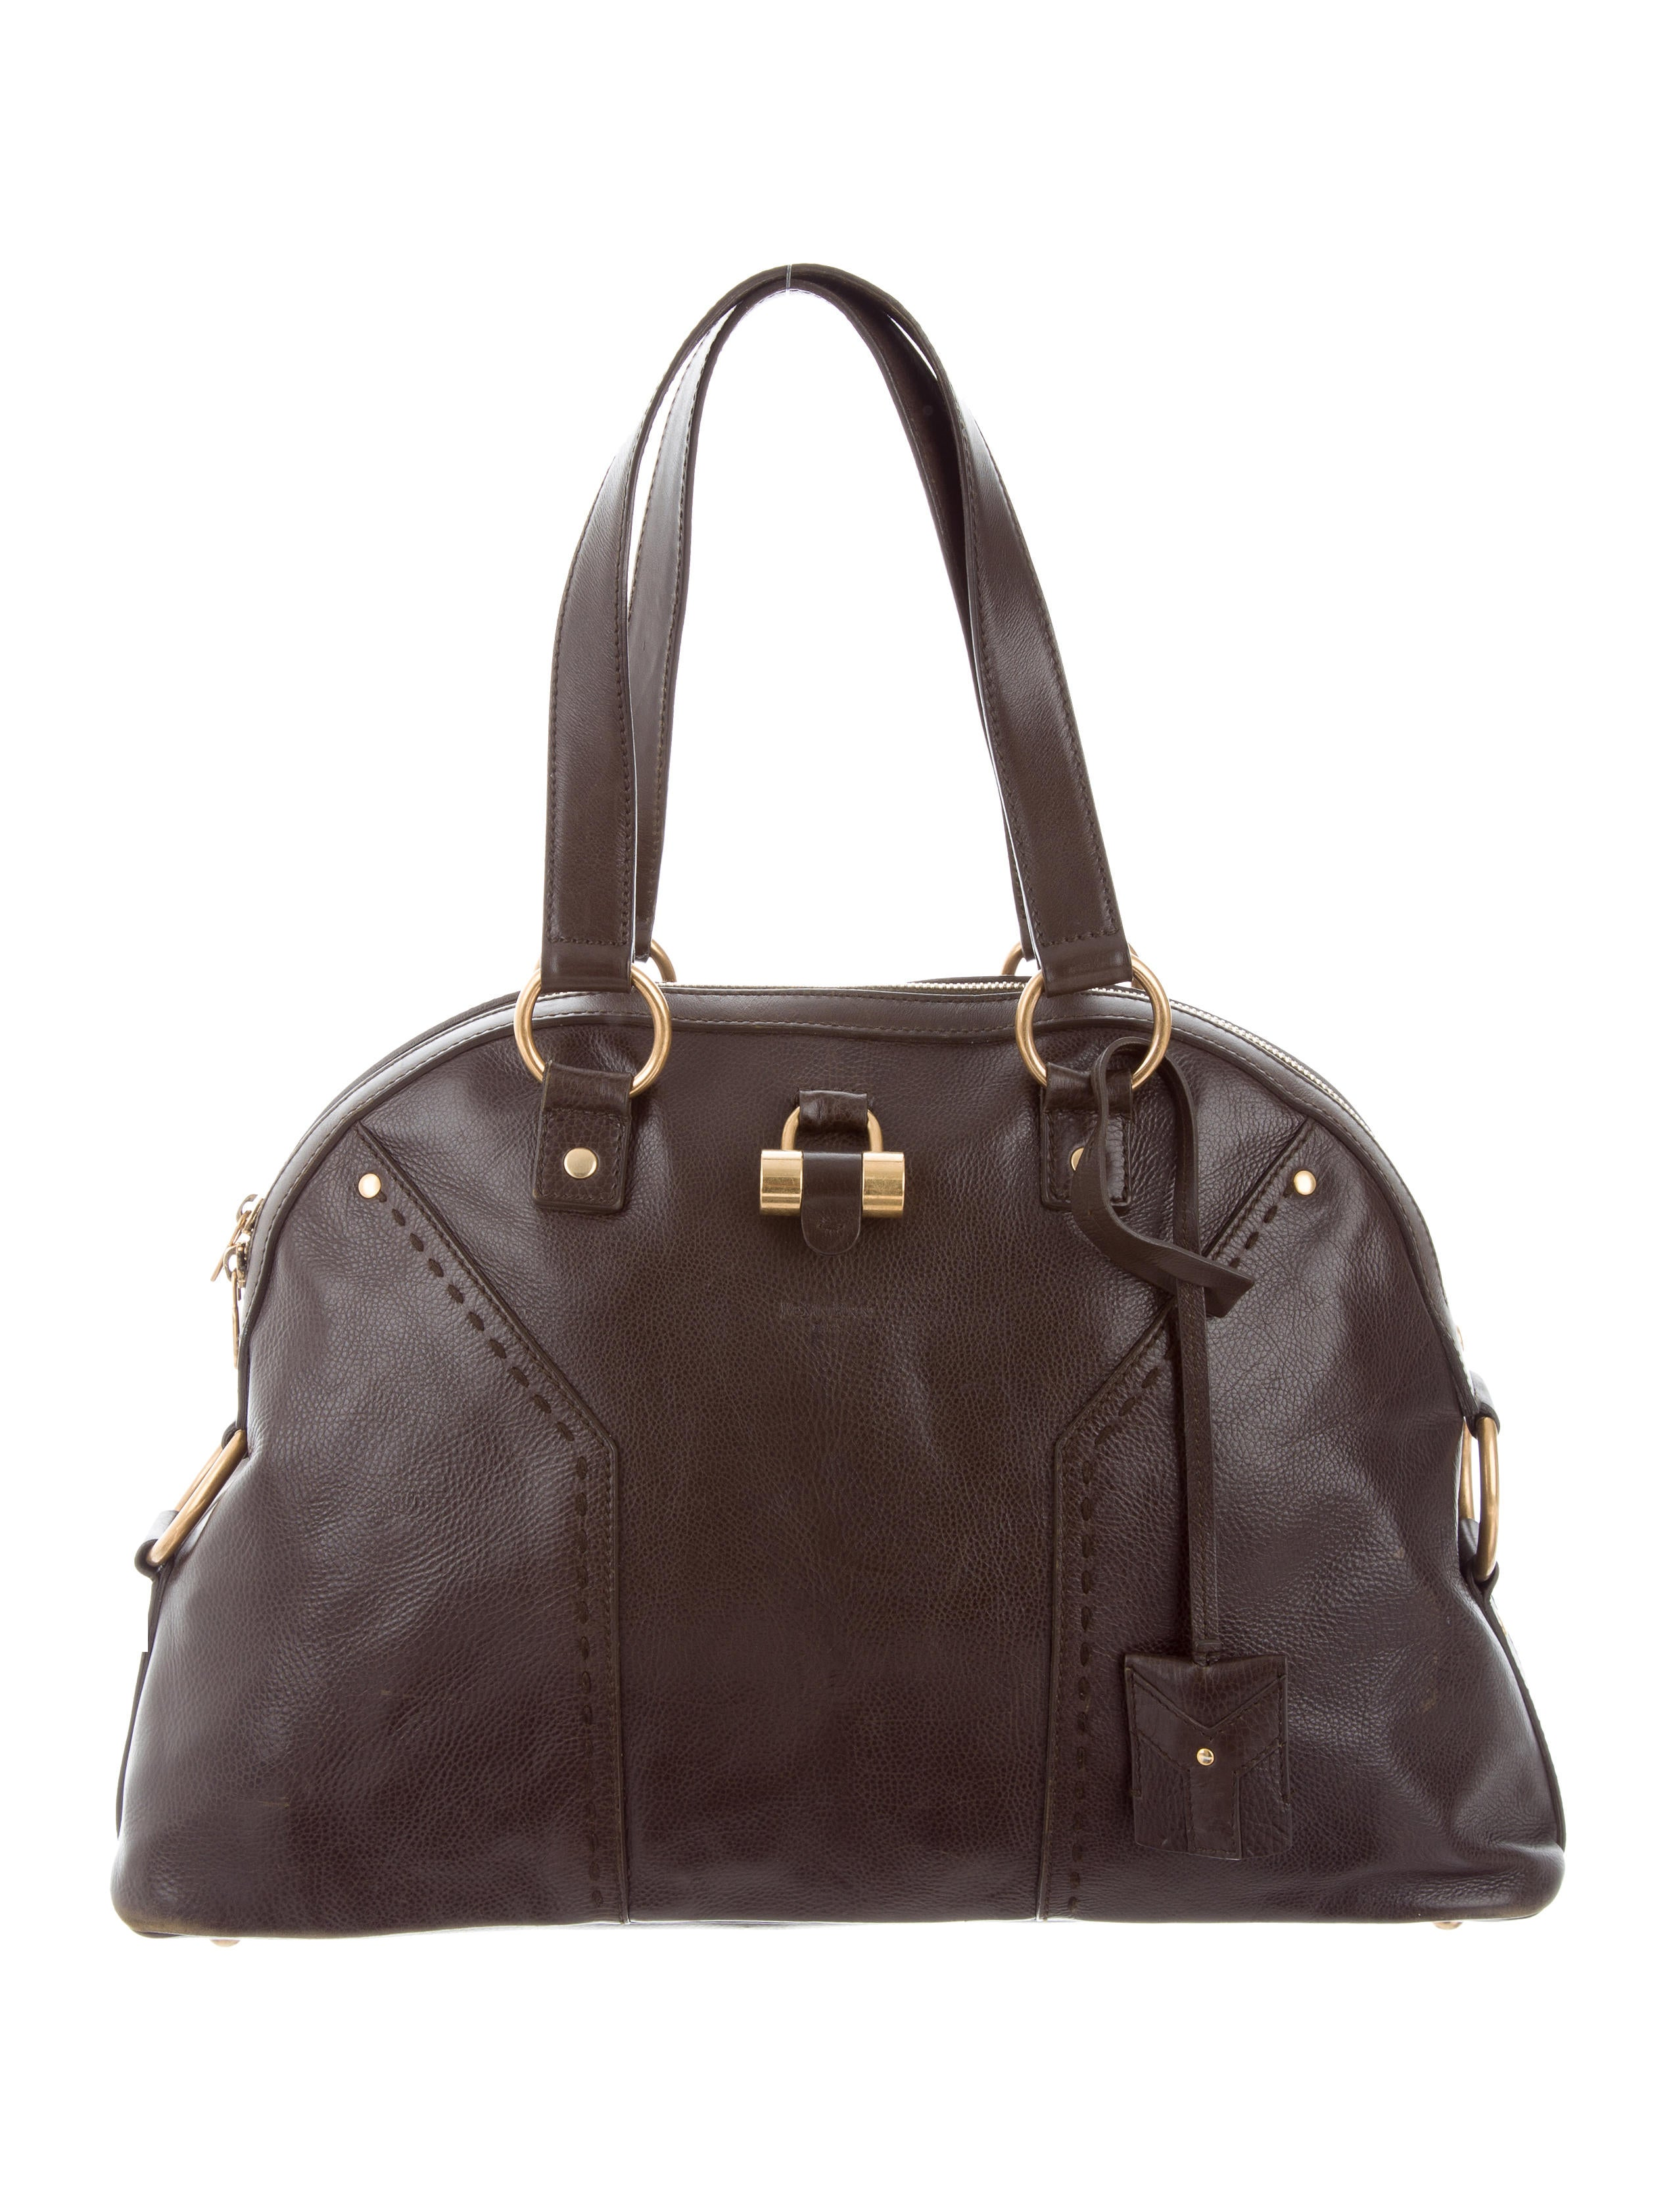 Yves Saint Laurent Leather Muse Bag - Handbags